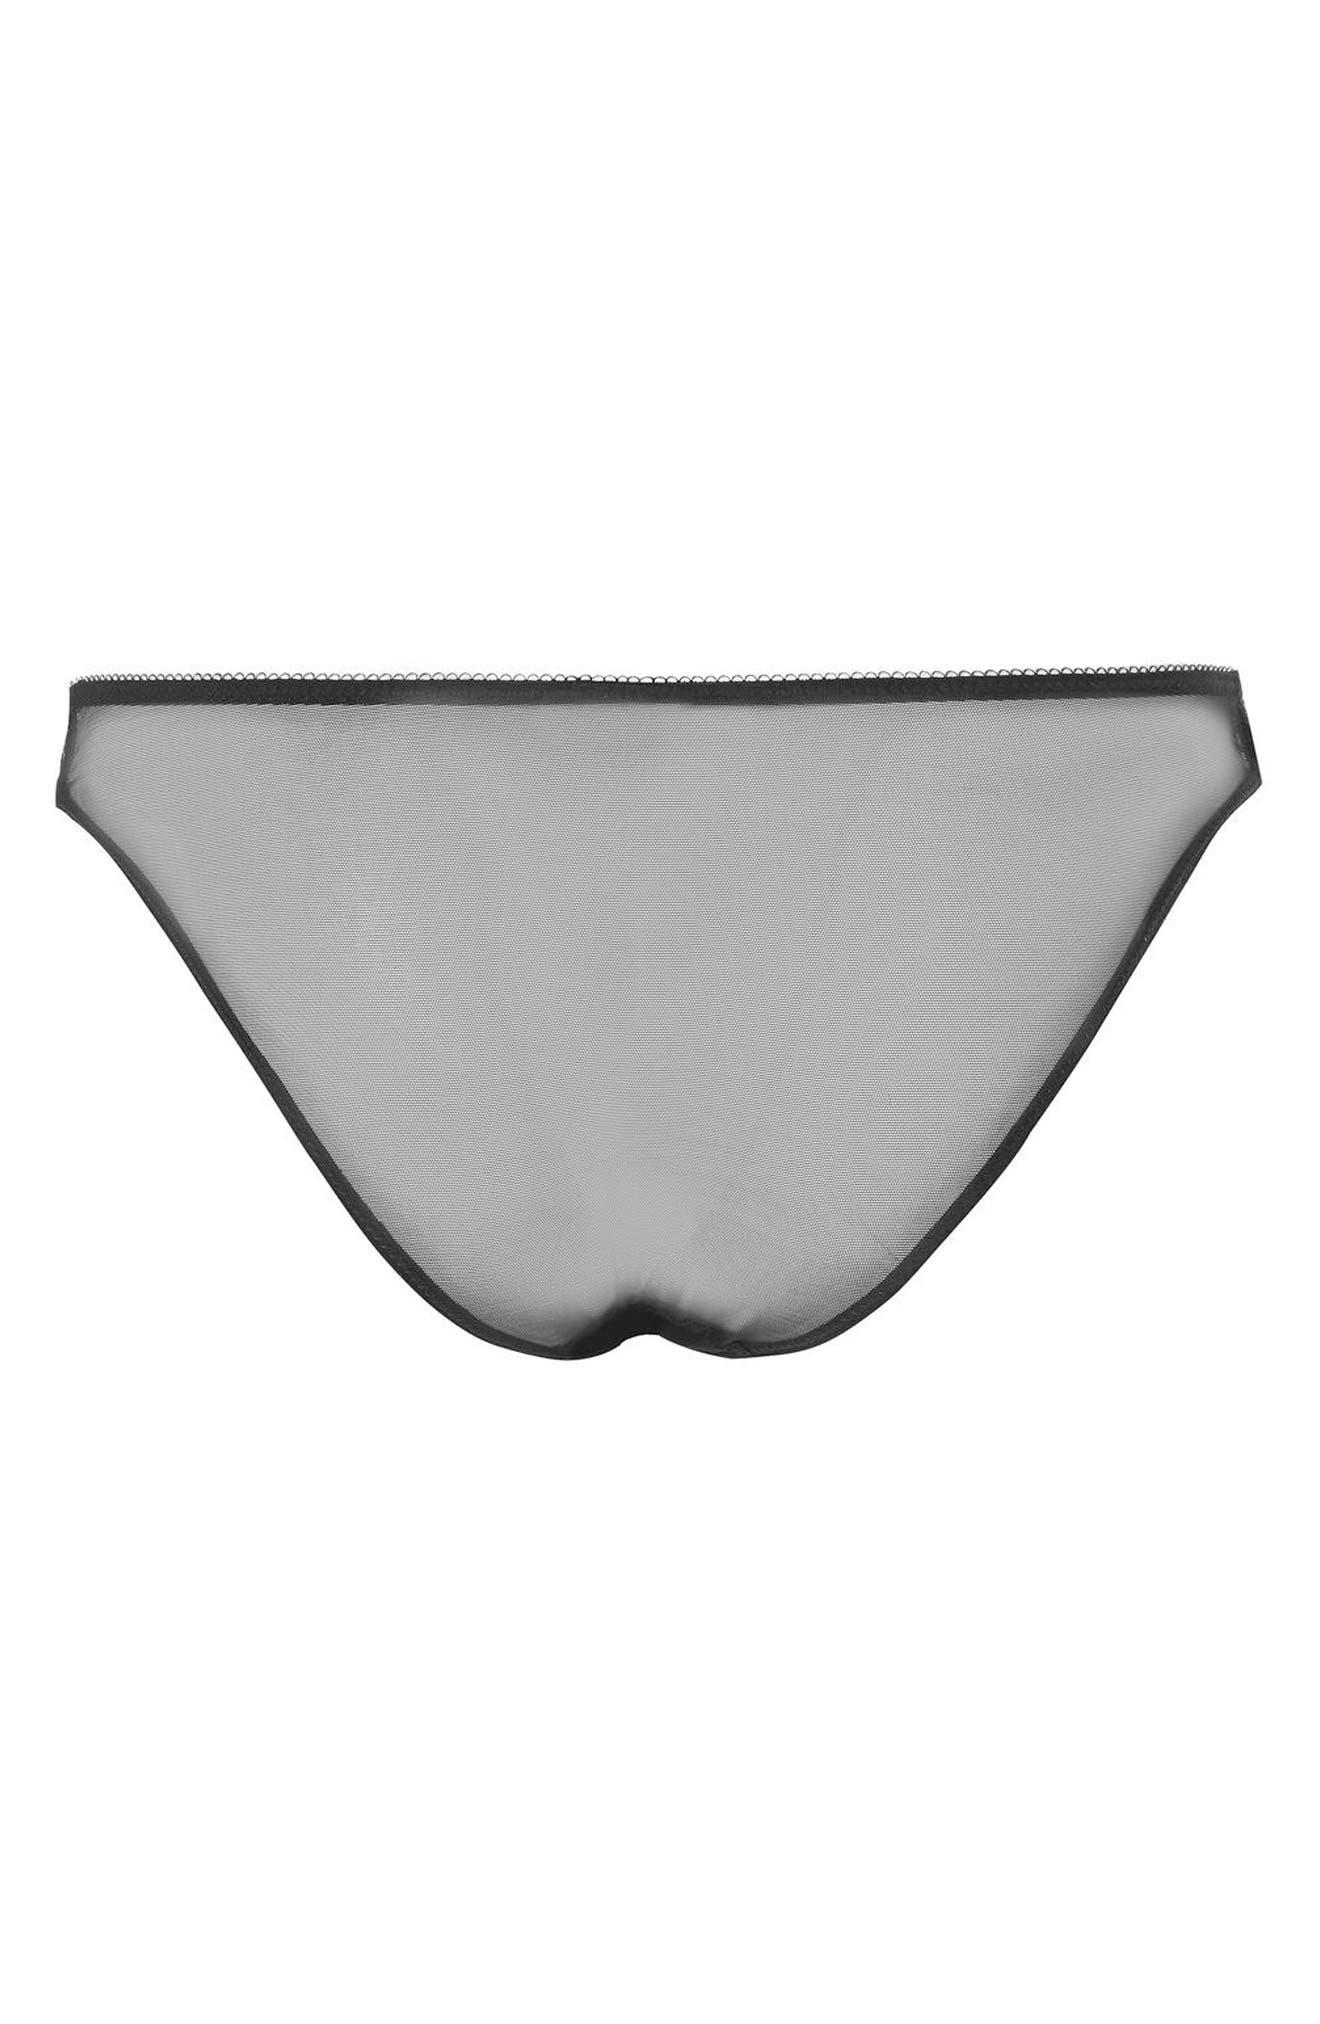 Serina Lace Panties,                             Alternate thumbnail 2, color,                             001